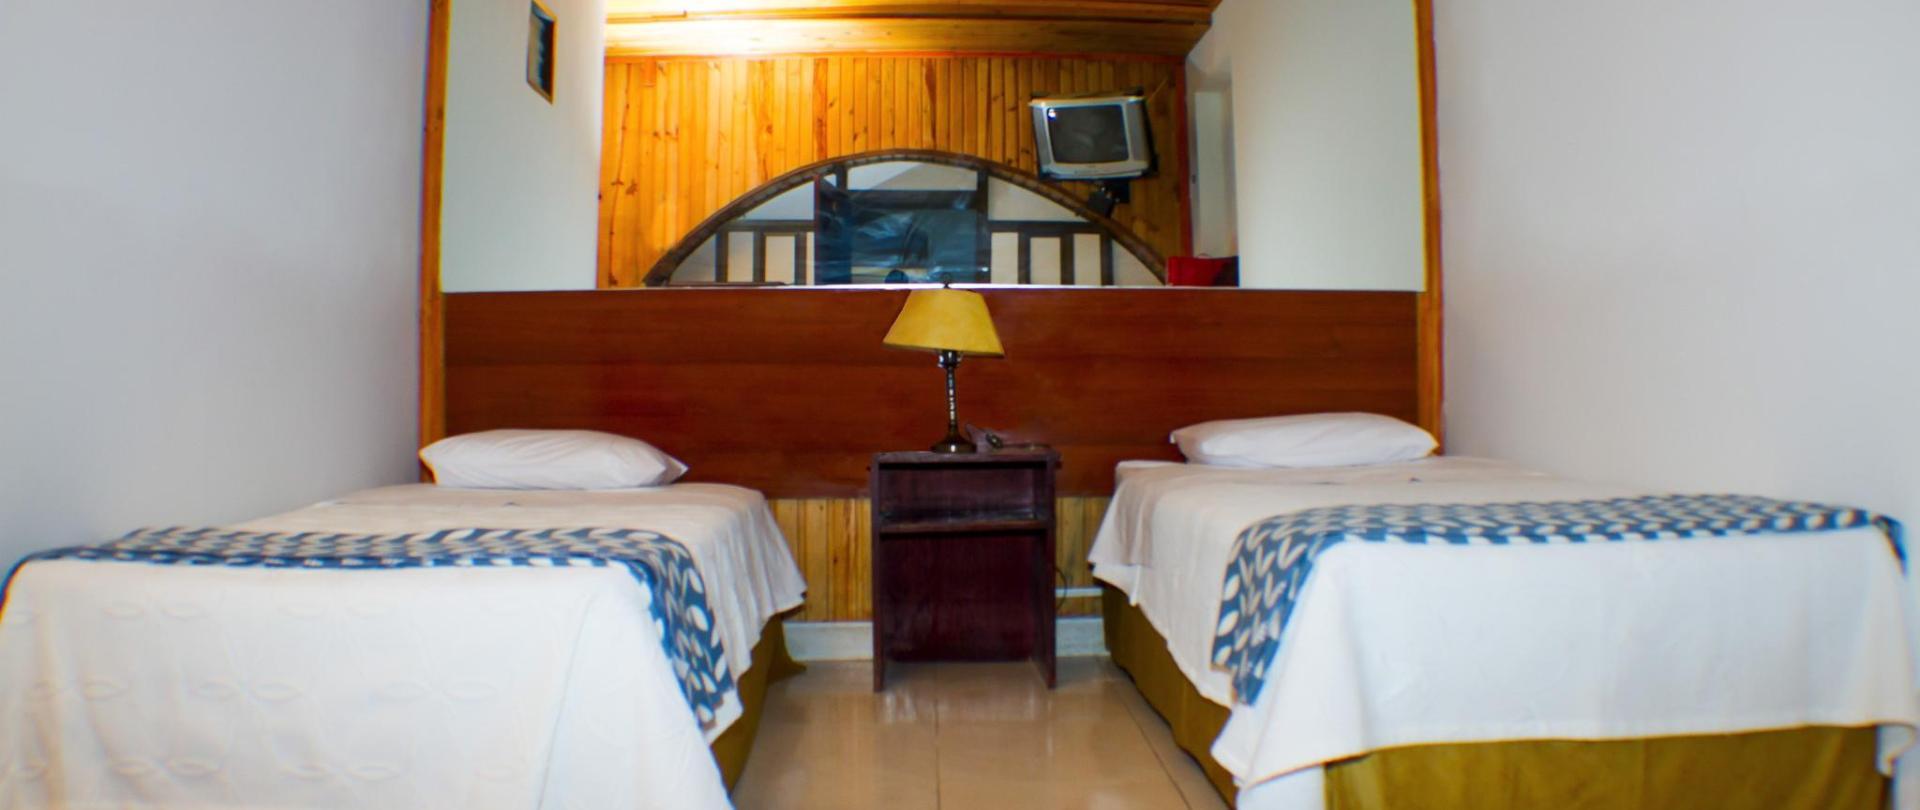 Hotel_Siar-8086.jpg